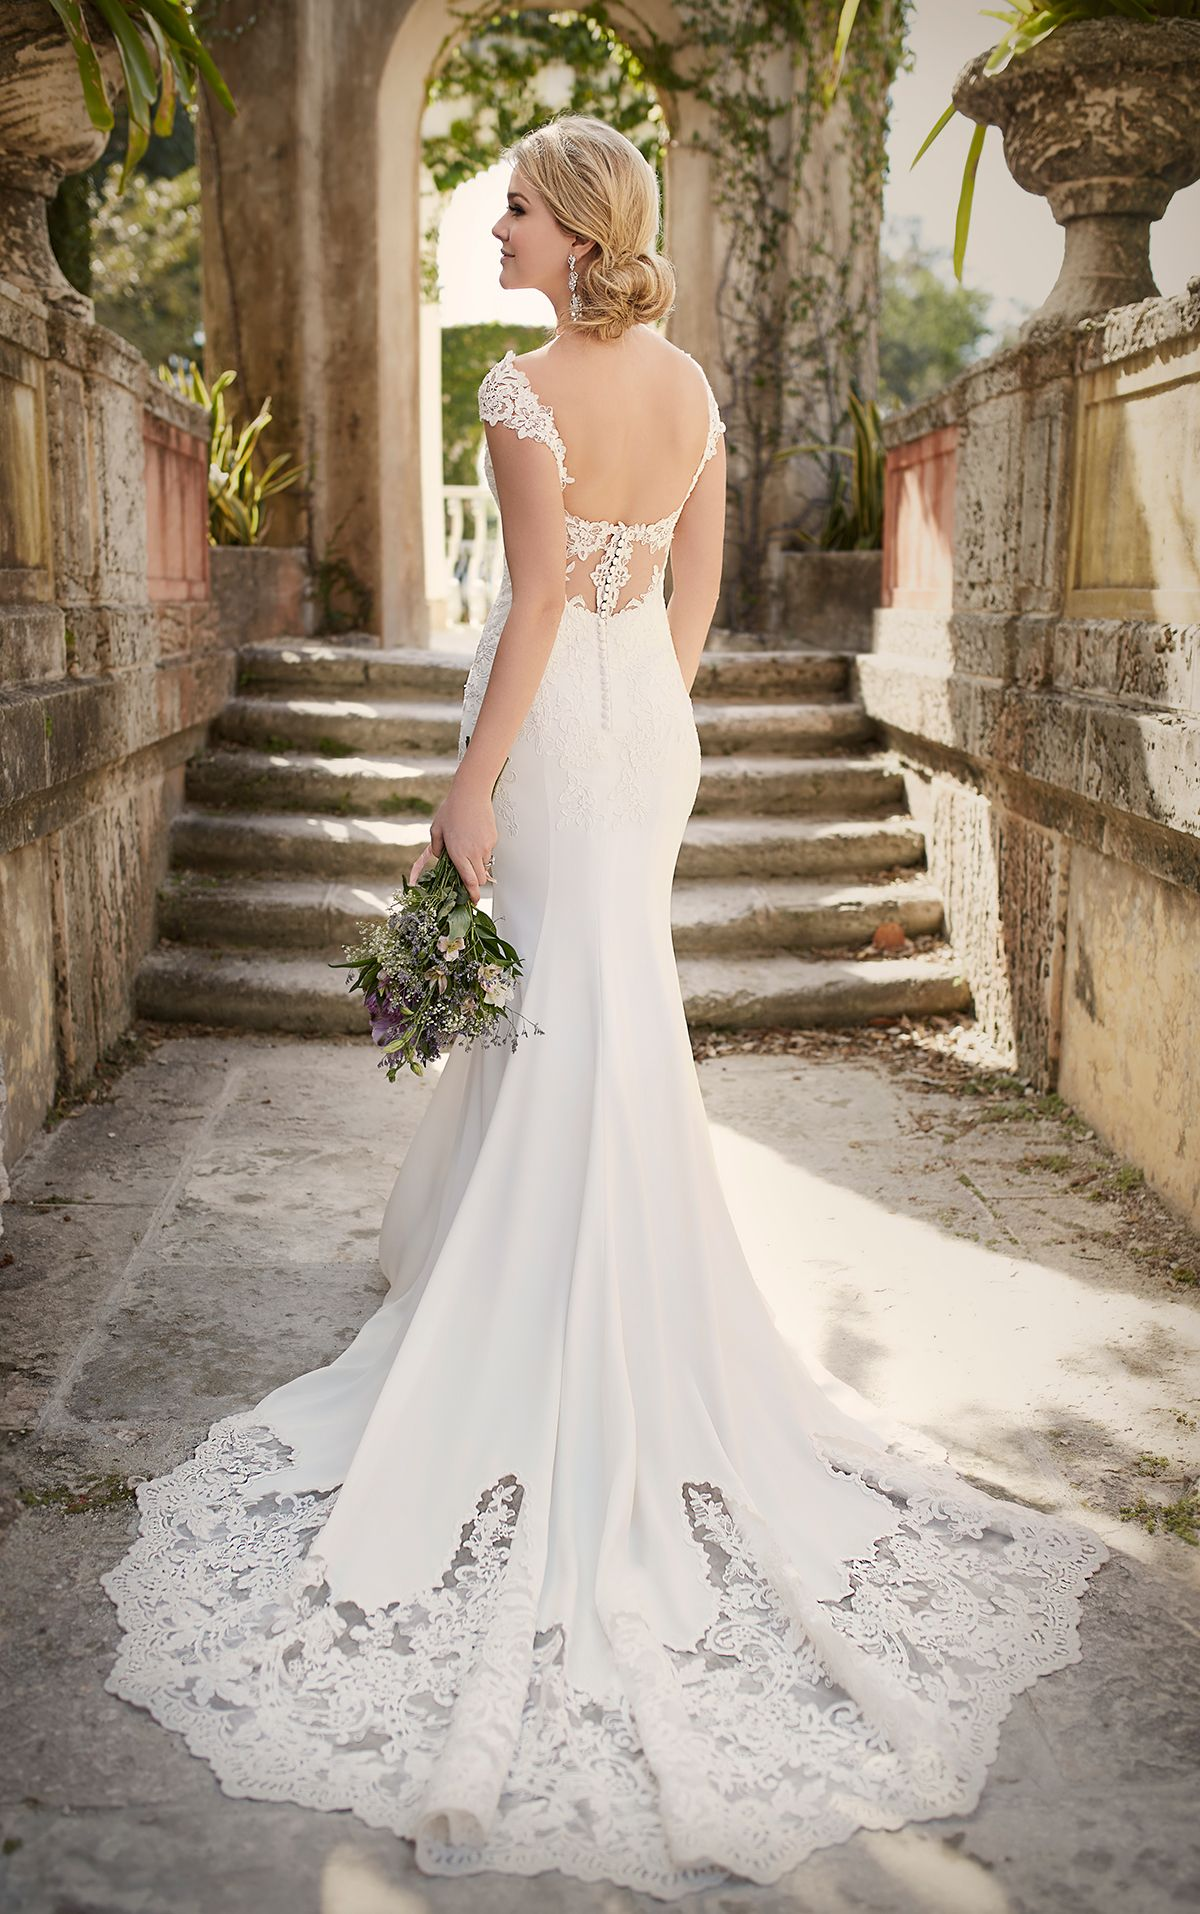 Lace Cap Sleeve Wedding Dress By Essense Of Australia Wedding Dresses Bridal Gowns Mermaid Wedding Dresses Lace